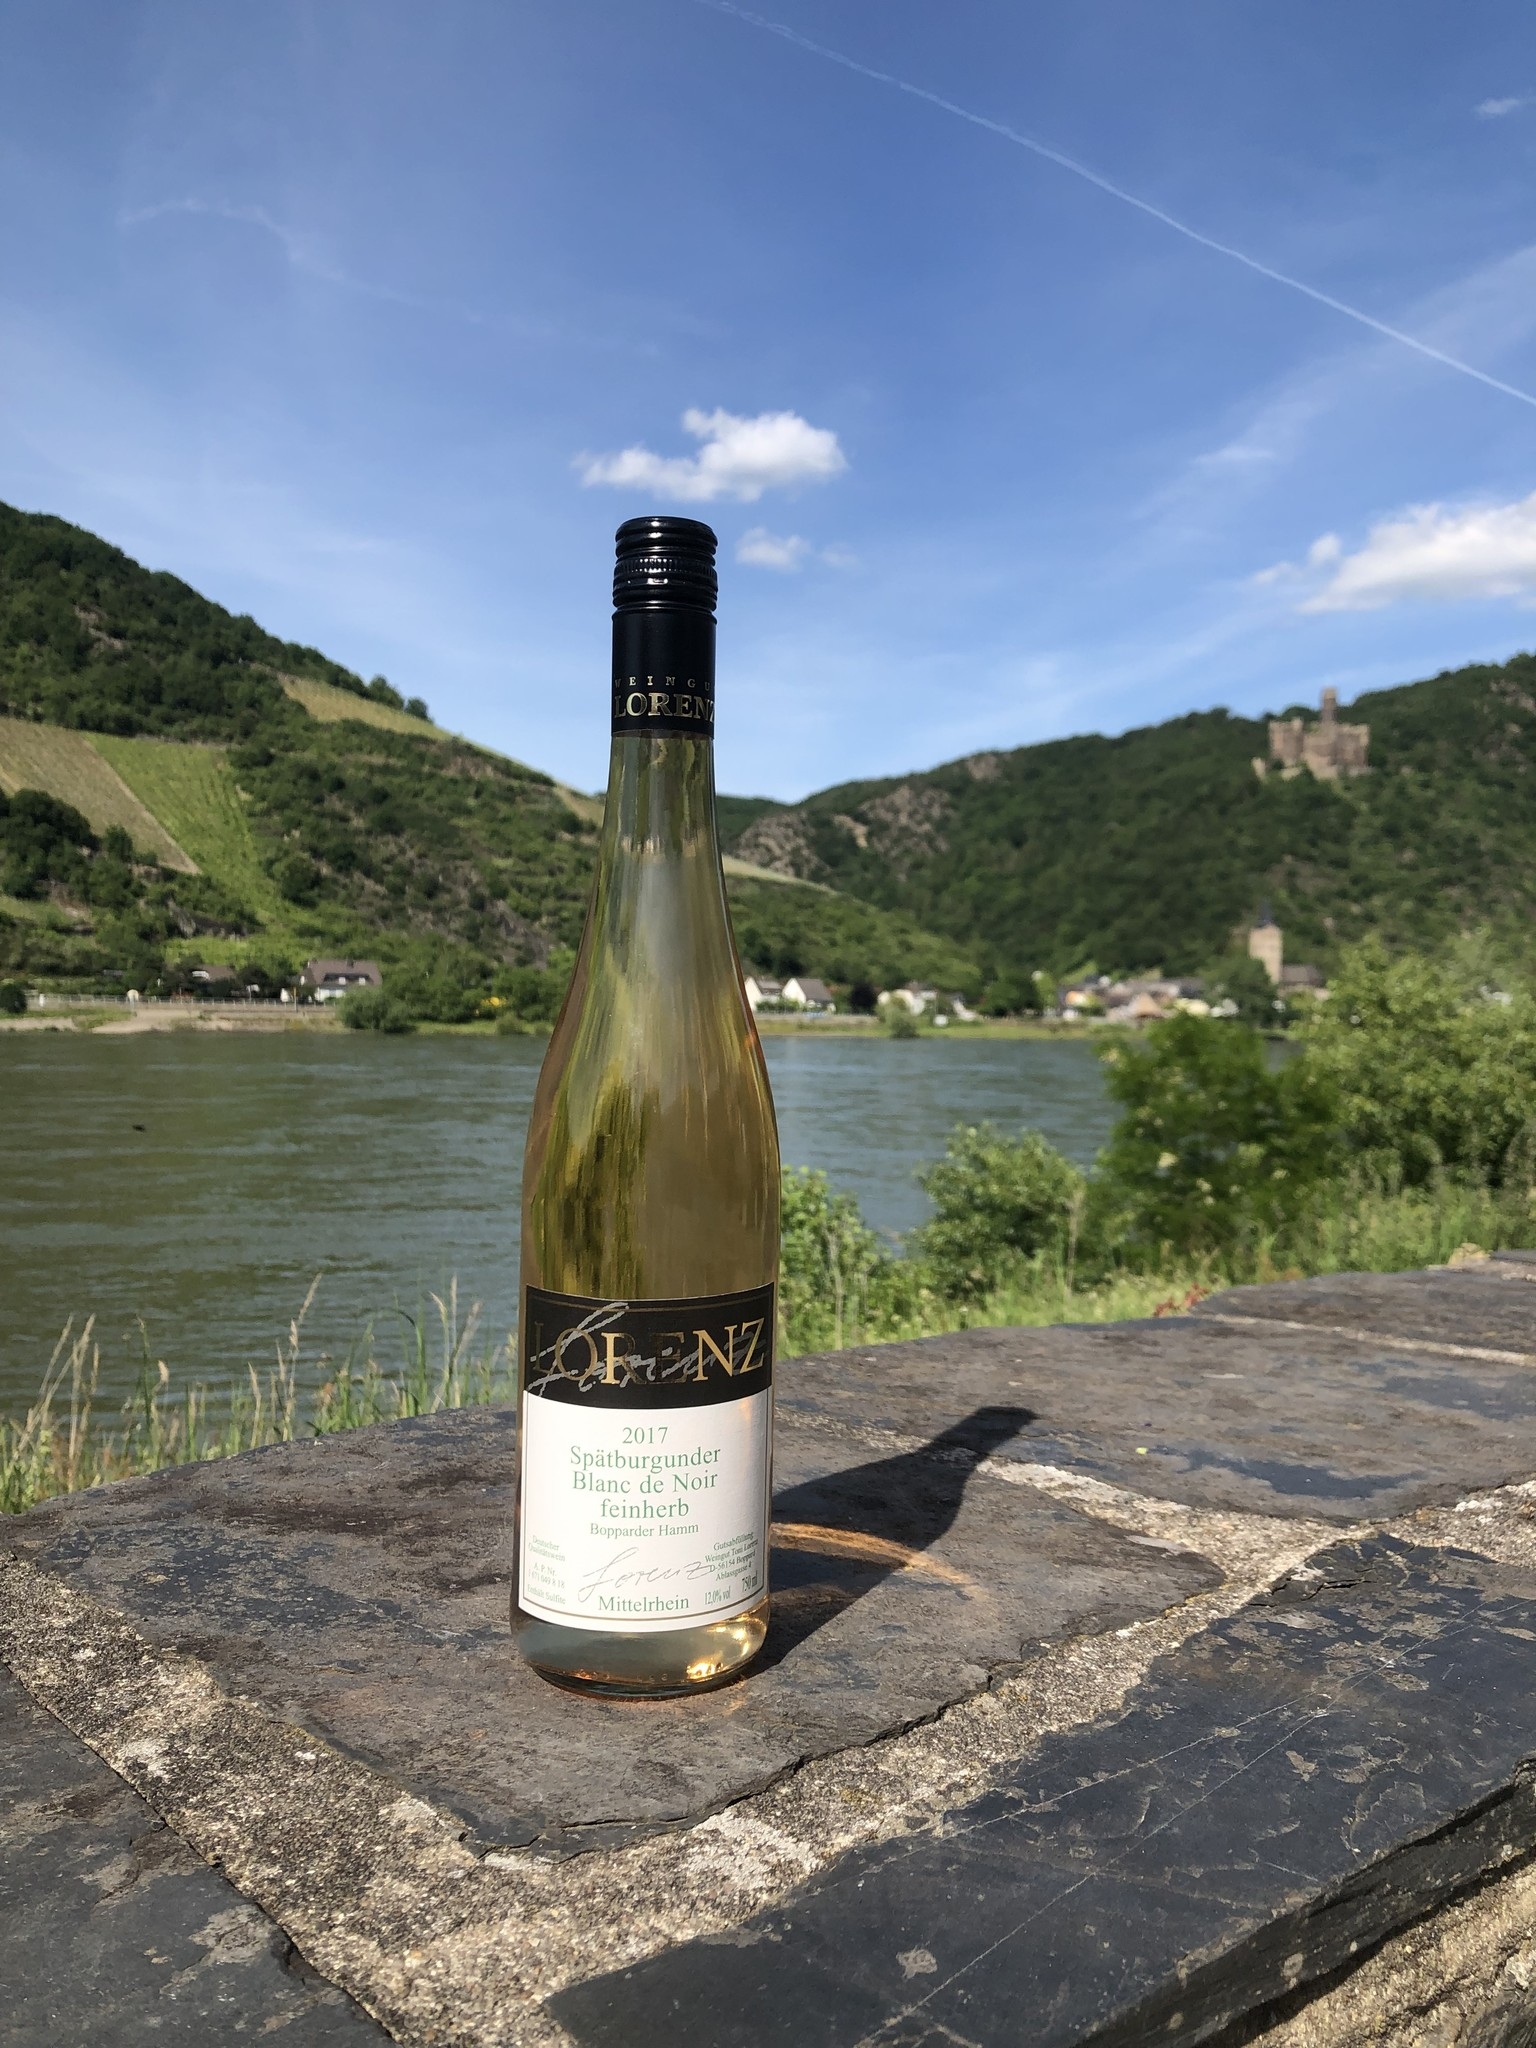 Weingut Toni Lorenz 2017 Spätburgunder Blanc de Noir feinherb